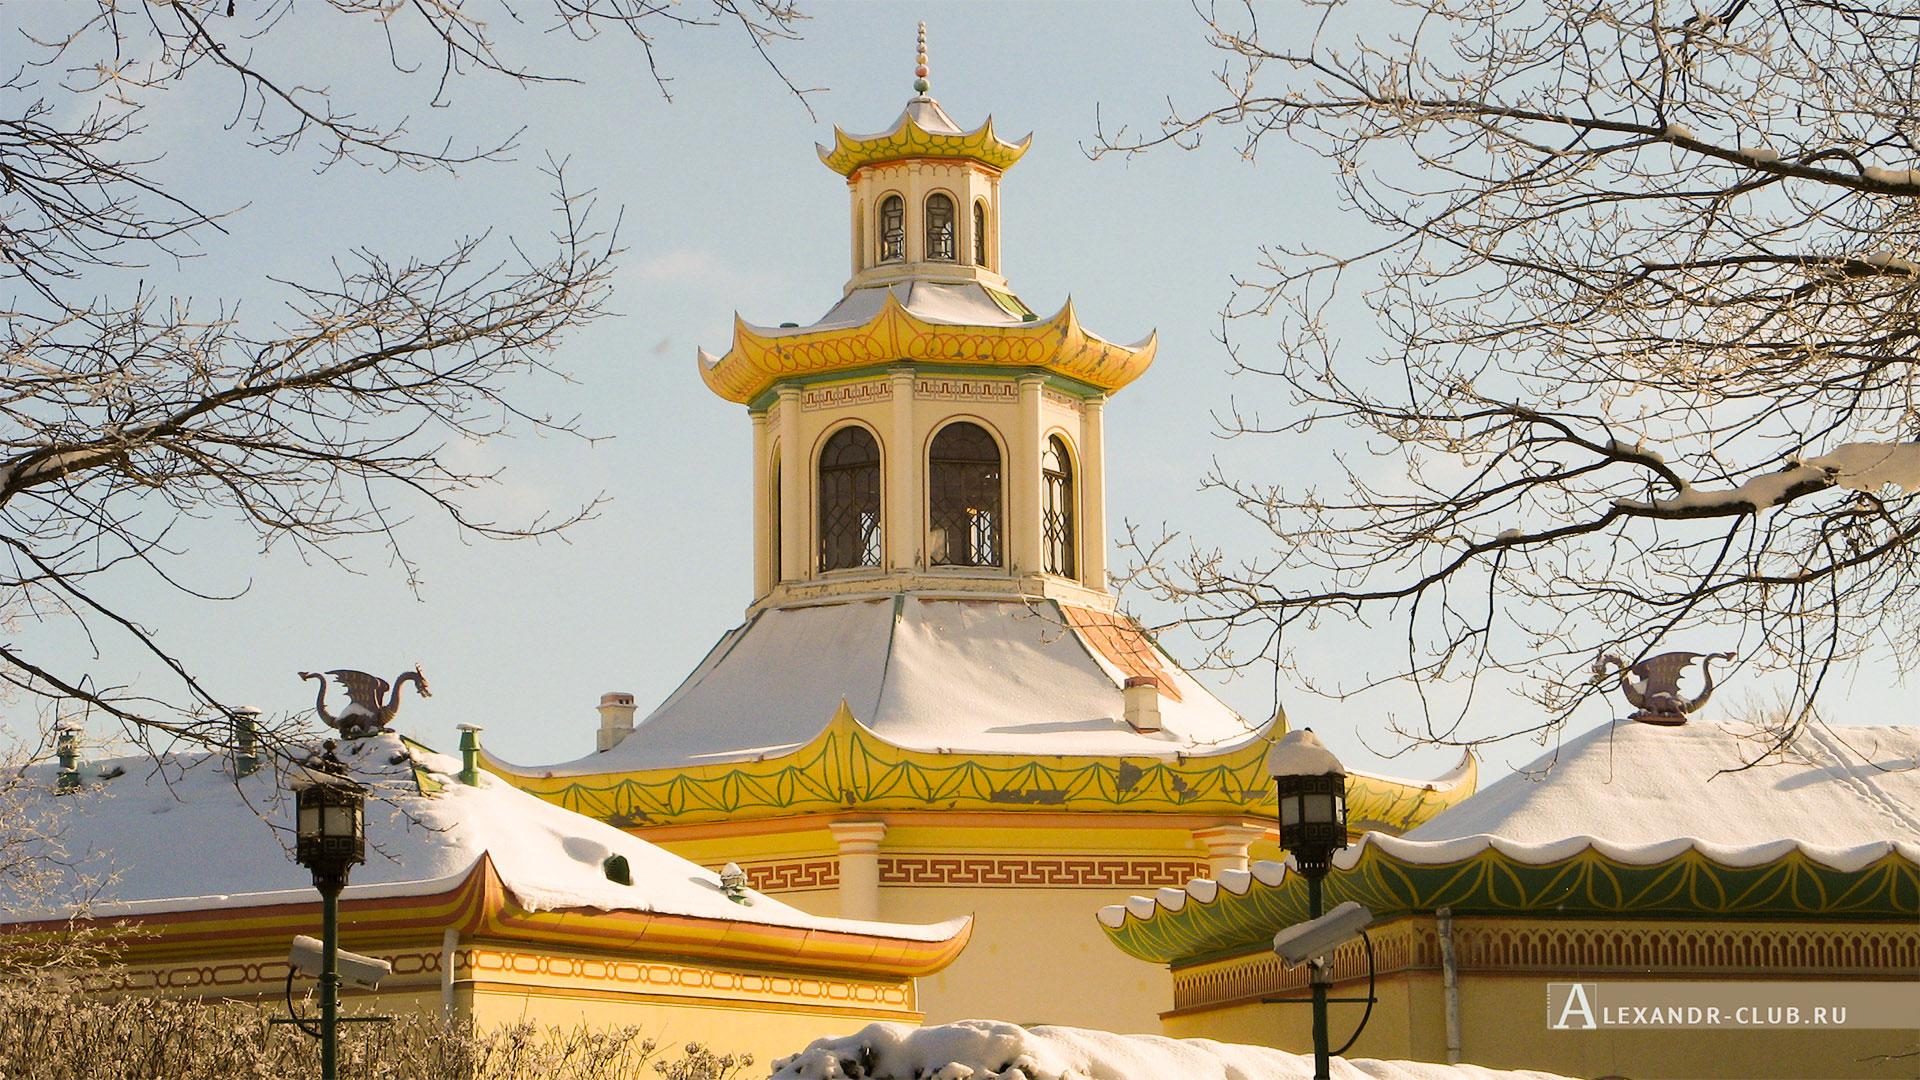 Пушкин, Царское Село, зима, Александровский парк, Китайская деревня